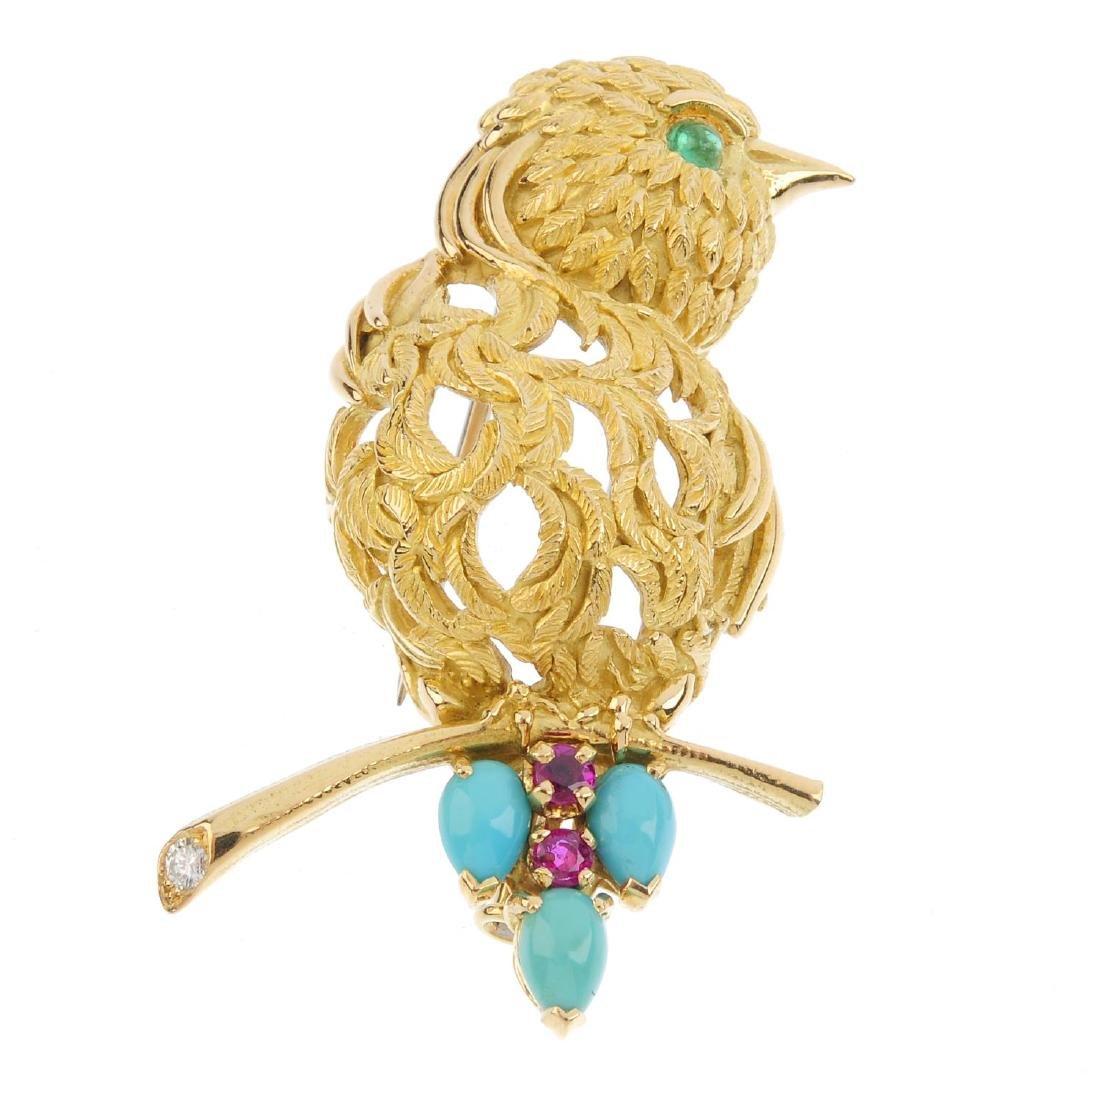 A 1950's 18ct gold diamond and gem-set bird brooch. The